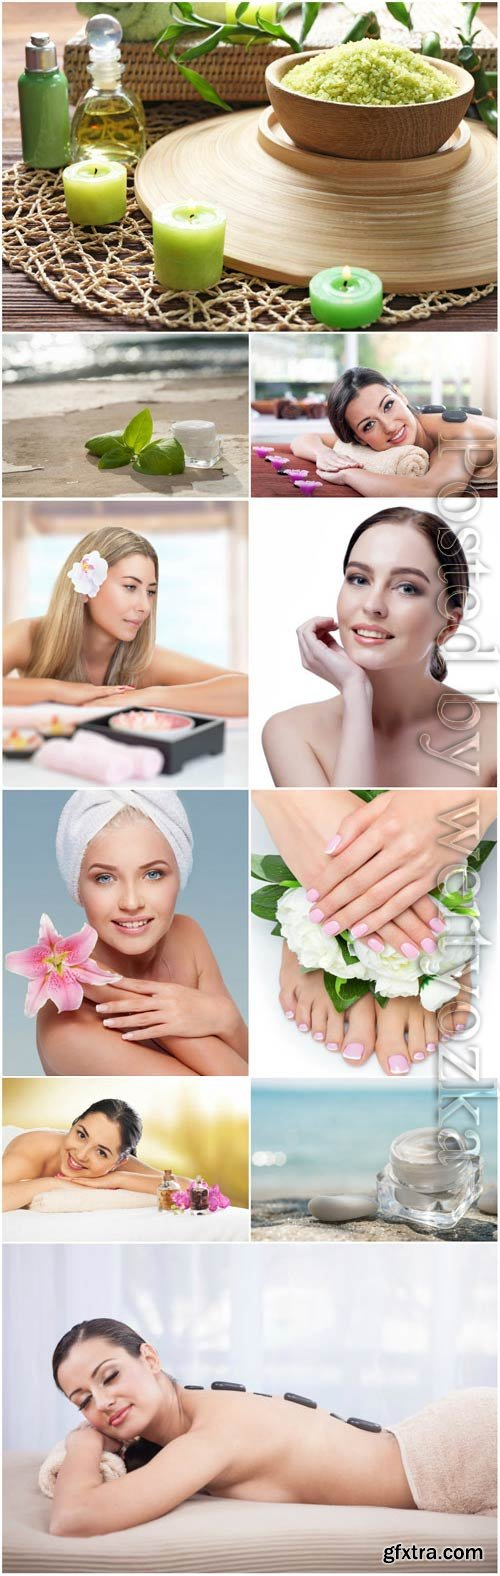 Girls in spa salon stock photo